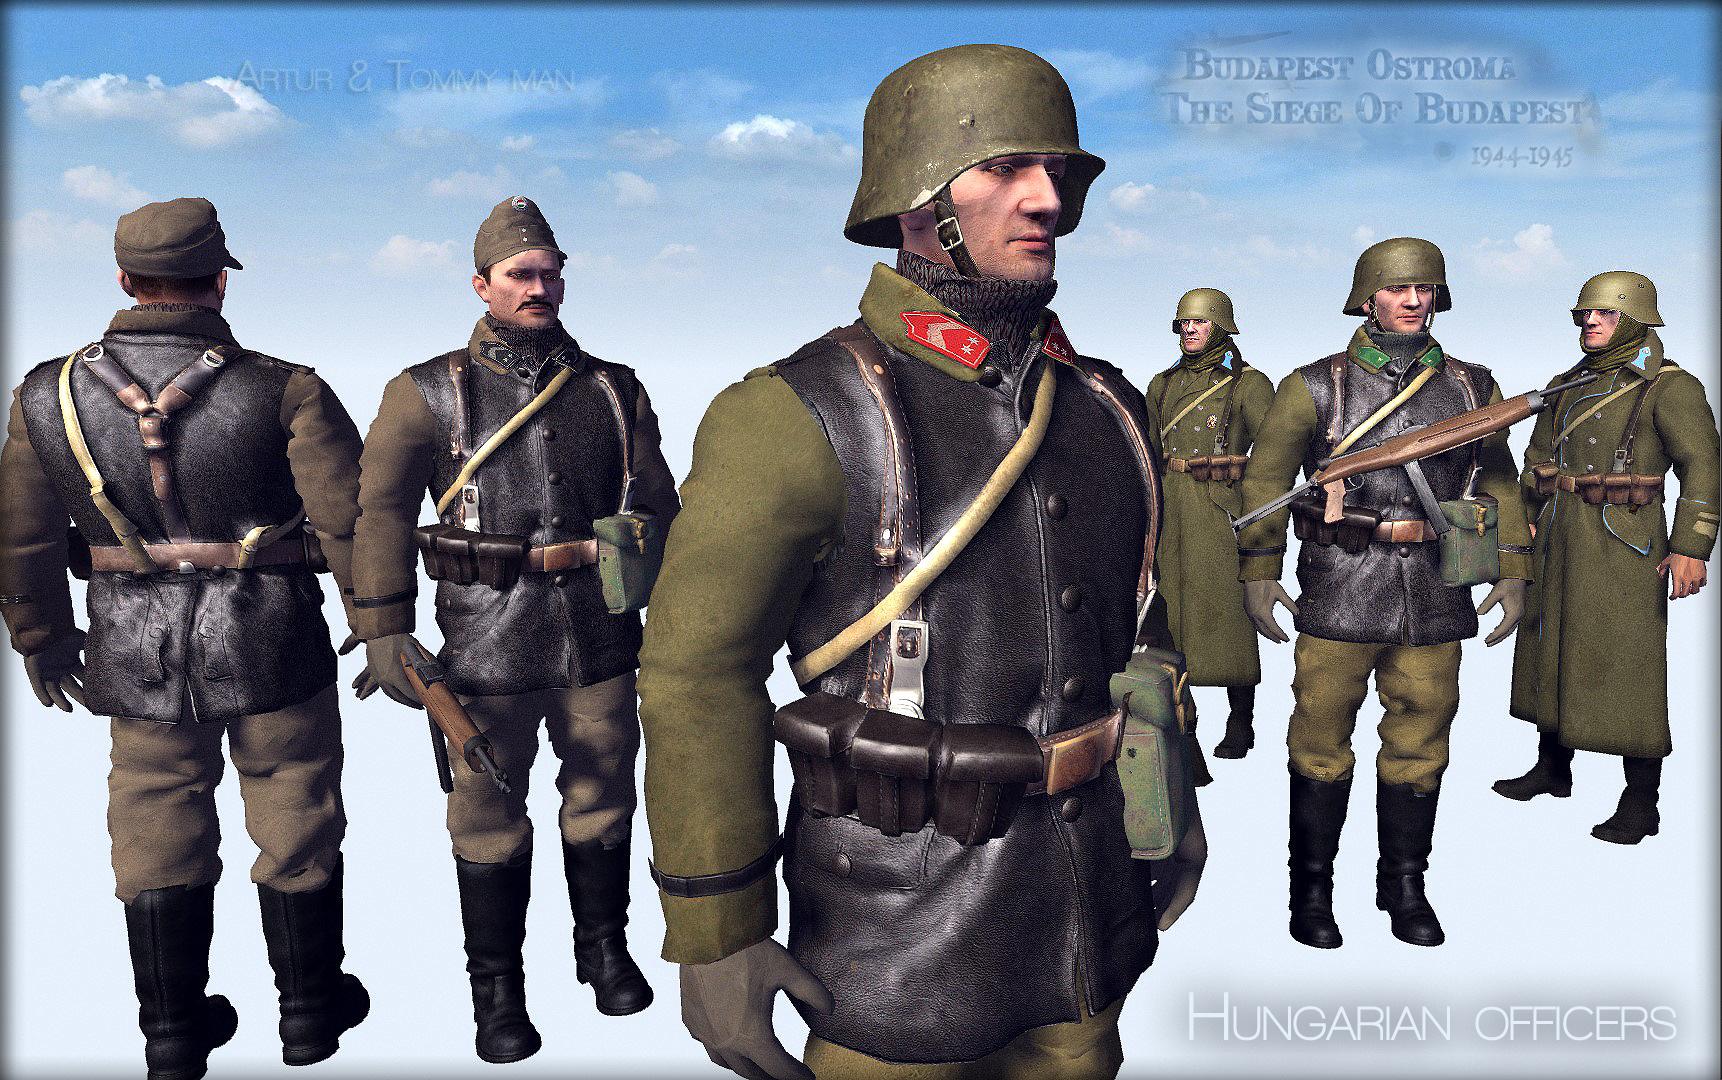 Magyar tisztek,Hungarian officers,Budapest siege,ostroma 1944-45